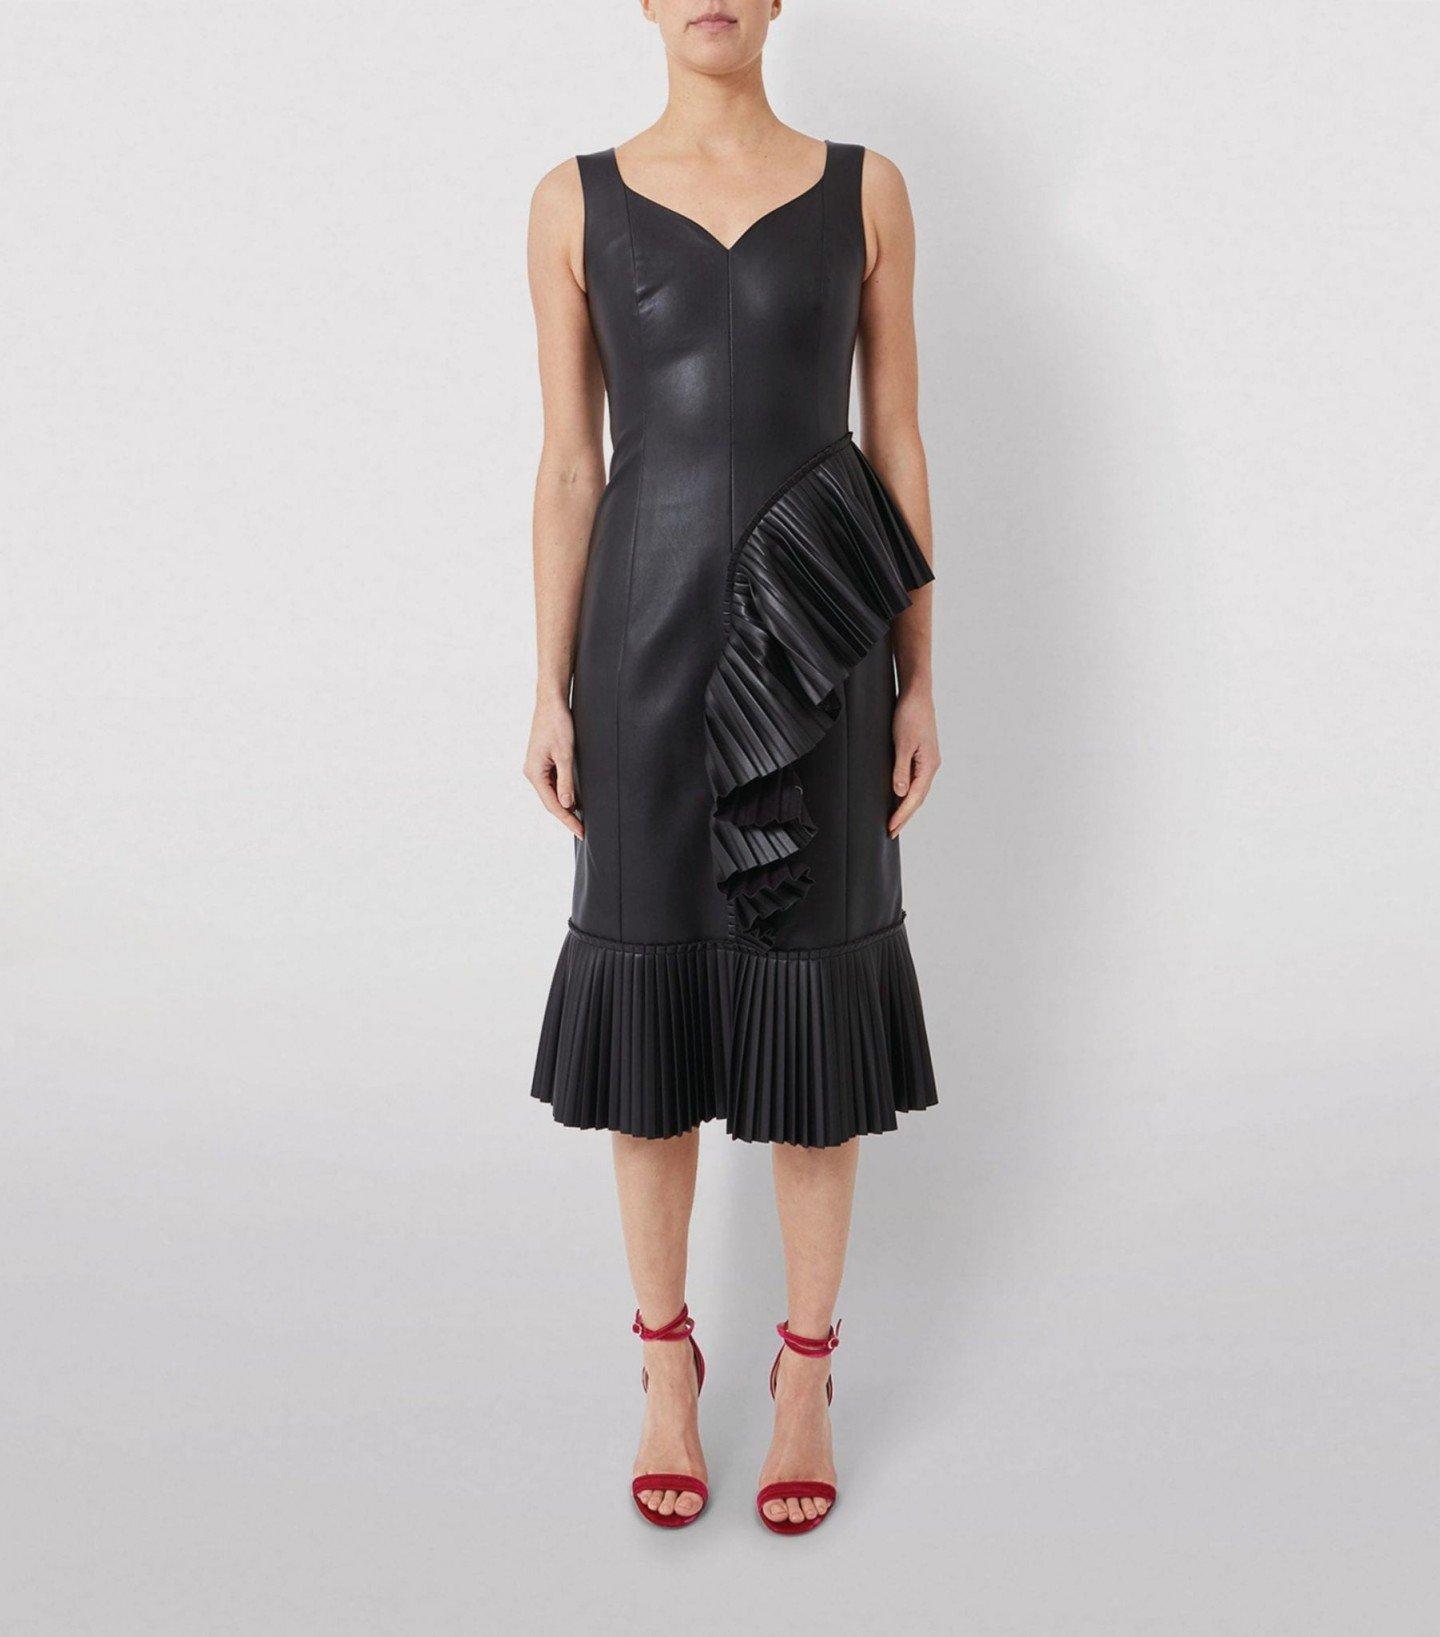 HUISHAN ZHANG Alanis Ruffled Dress